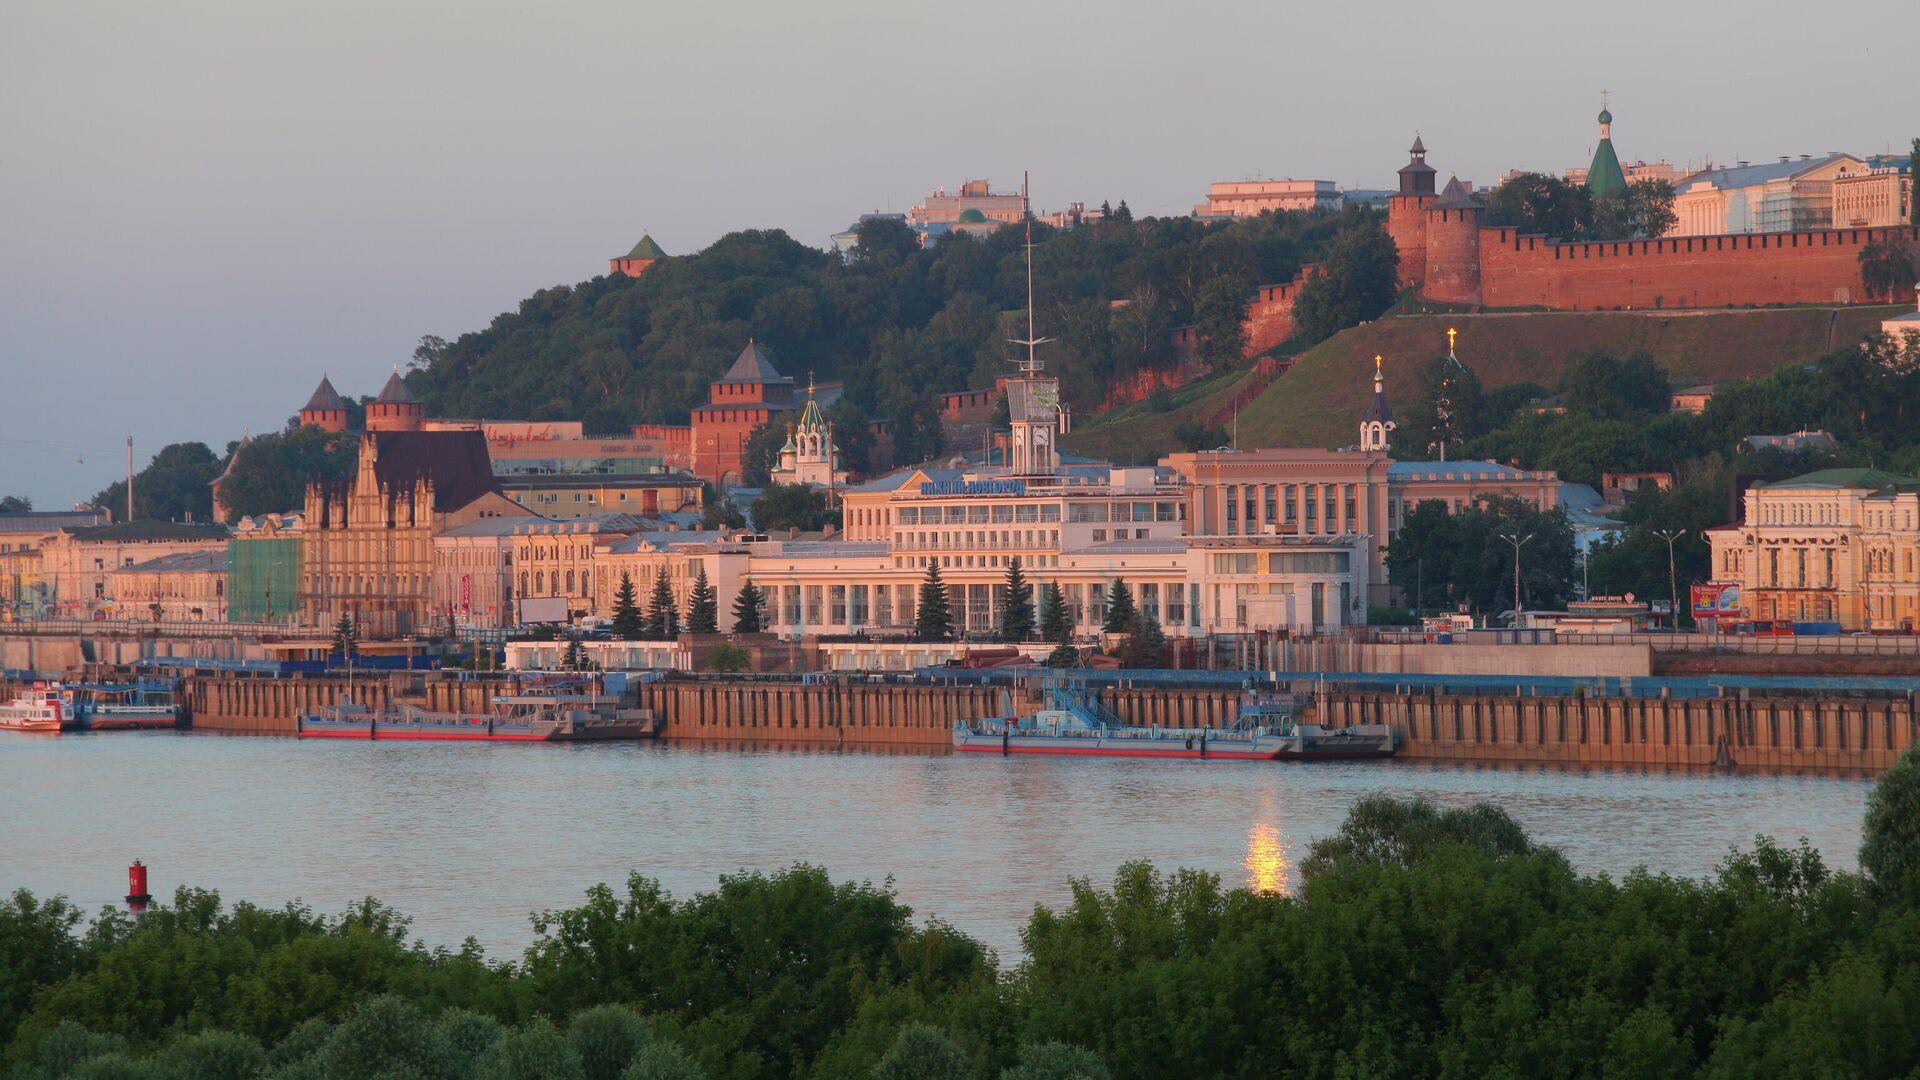 1560477336 0:320:3072:2048 1920x0 80 0 0 b52af840a42546255222c36faa8cf742 - МВД: в Нижнем Новгороде мошенники обманули 120 жителей на 15 миллионов рублей на кредитах